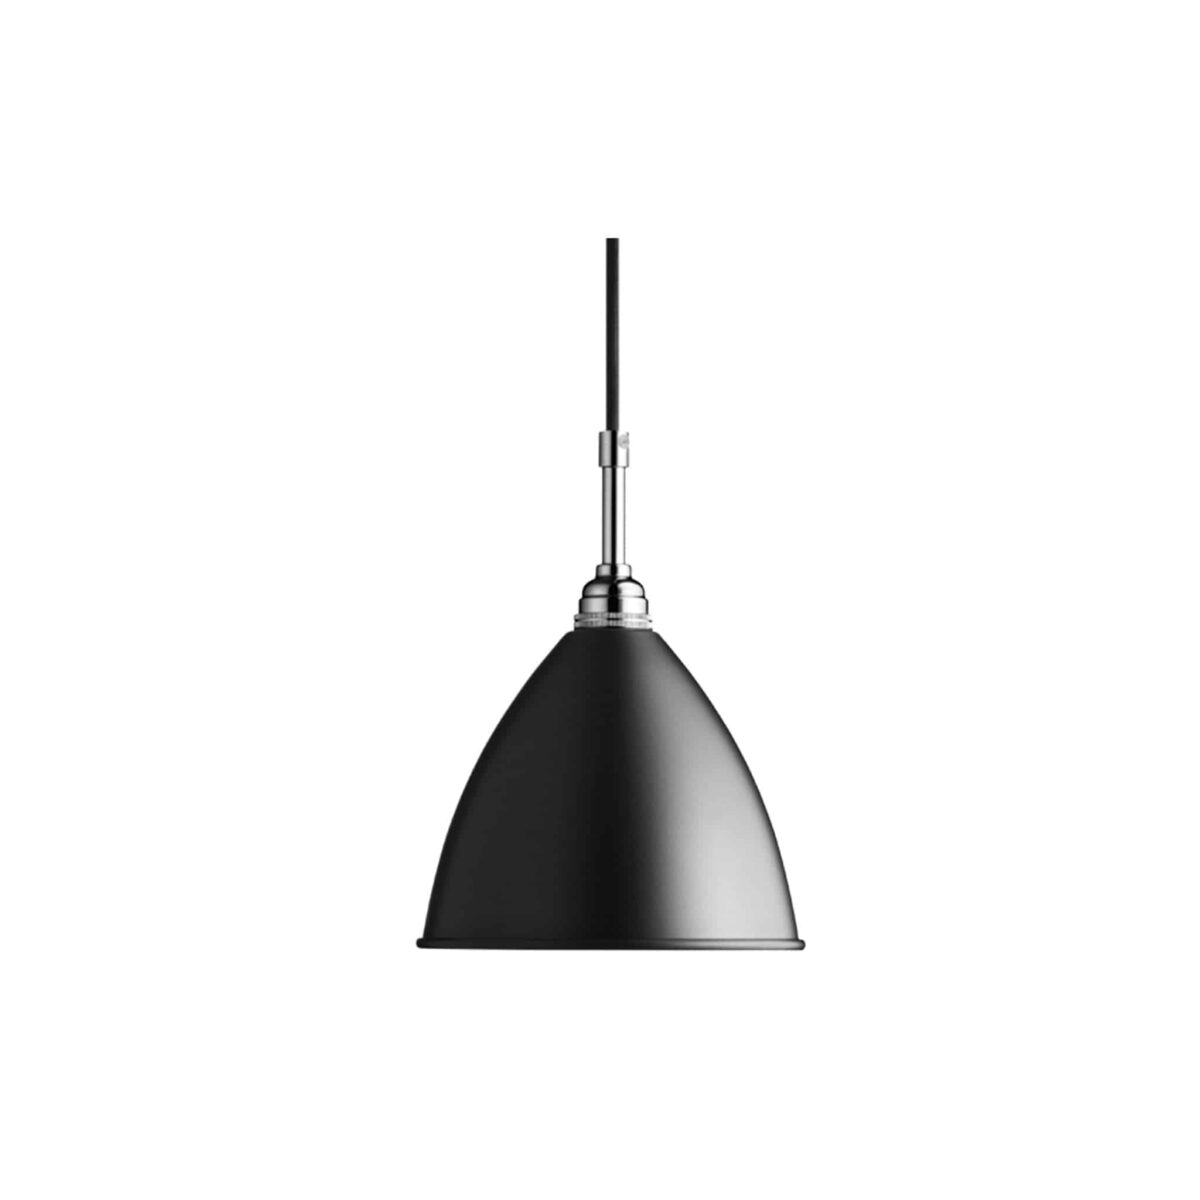 gubi-bestlite-bl9m-pendant-black-chrome-001_1215f2bb-41dd-40ee-8ca5-833836b5ee13.jpeg